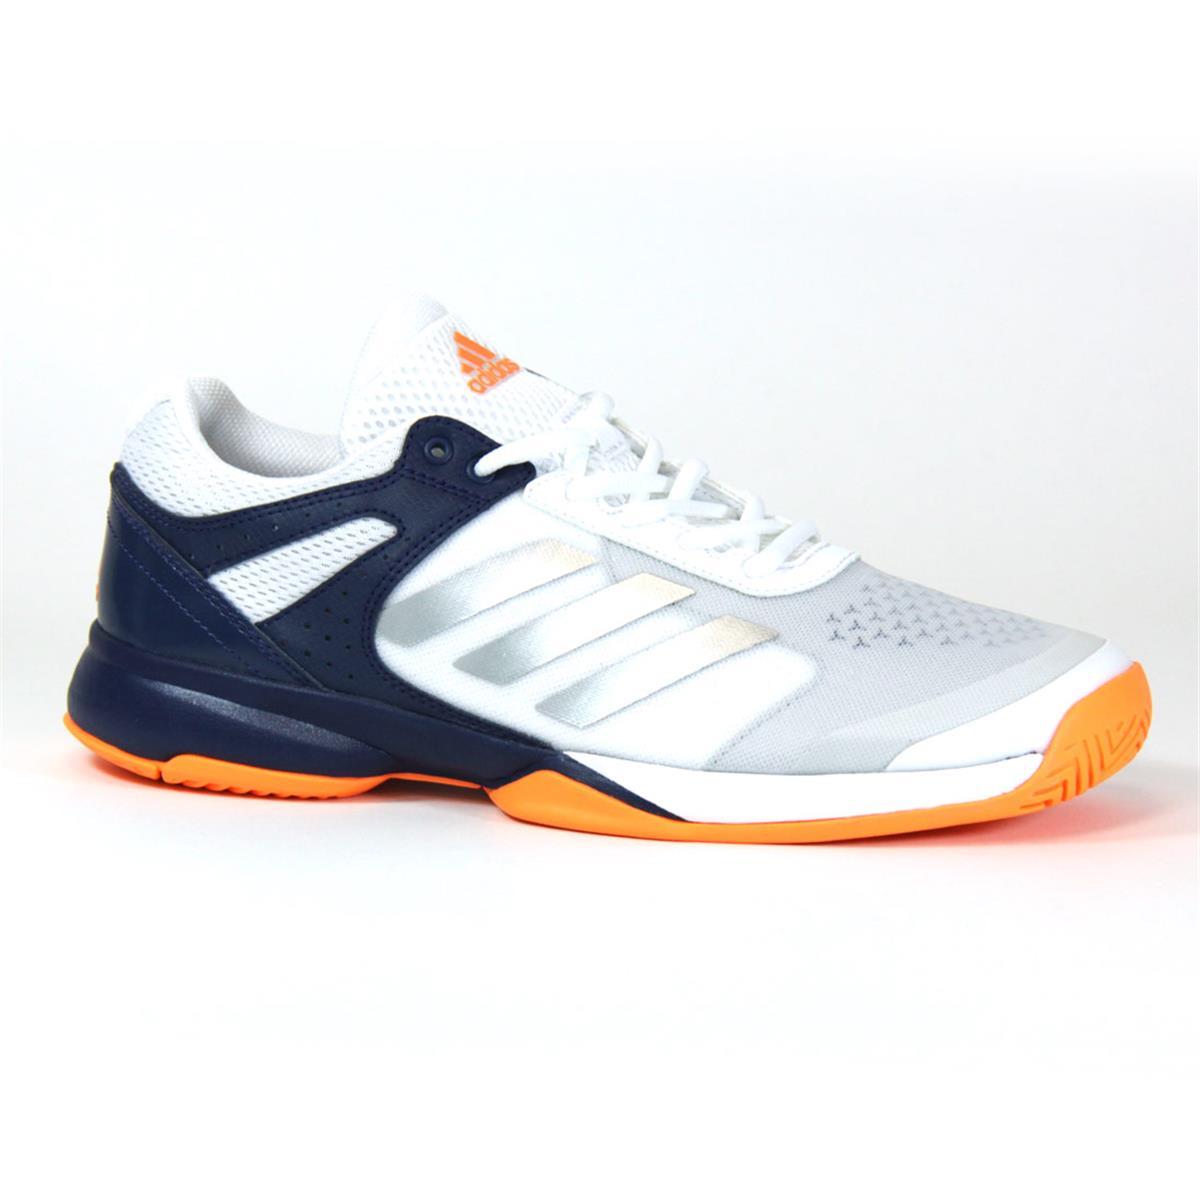 adidas adizero court mens tennis shoes by directtennis